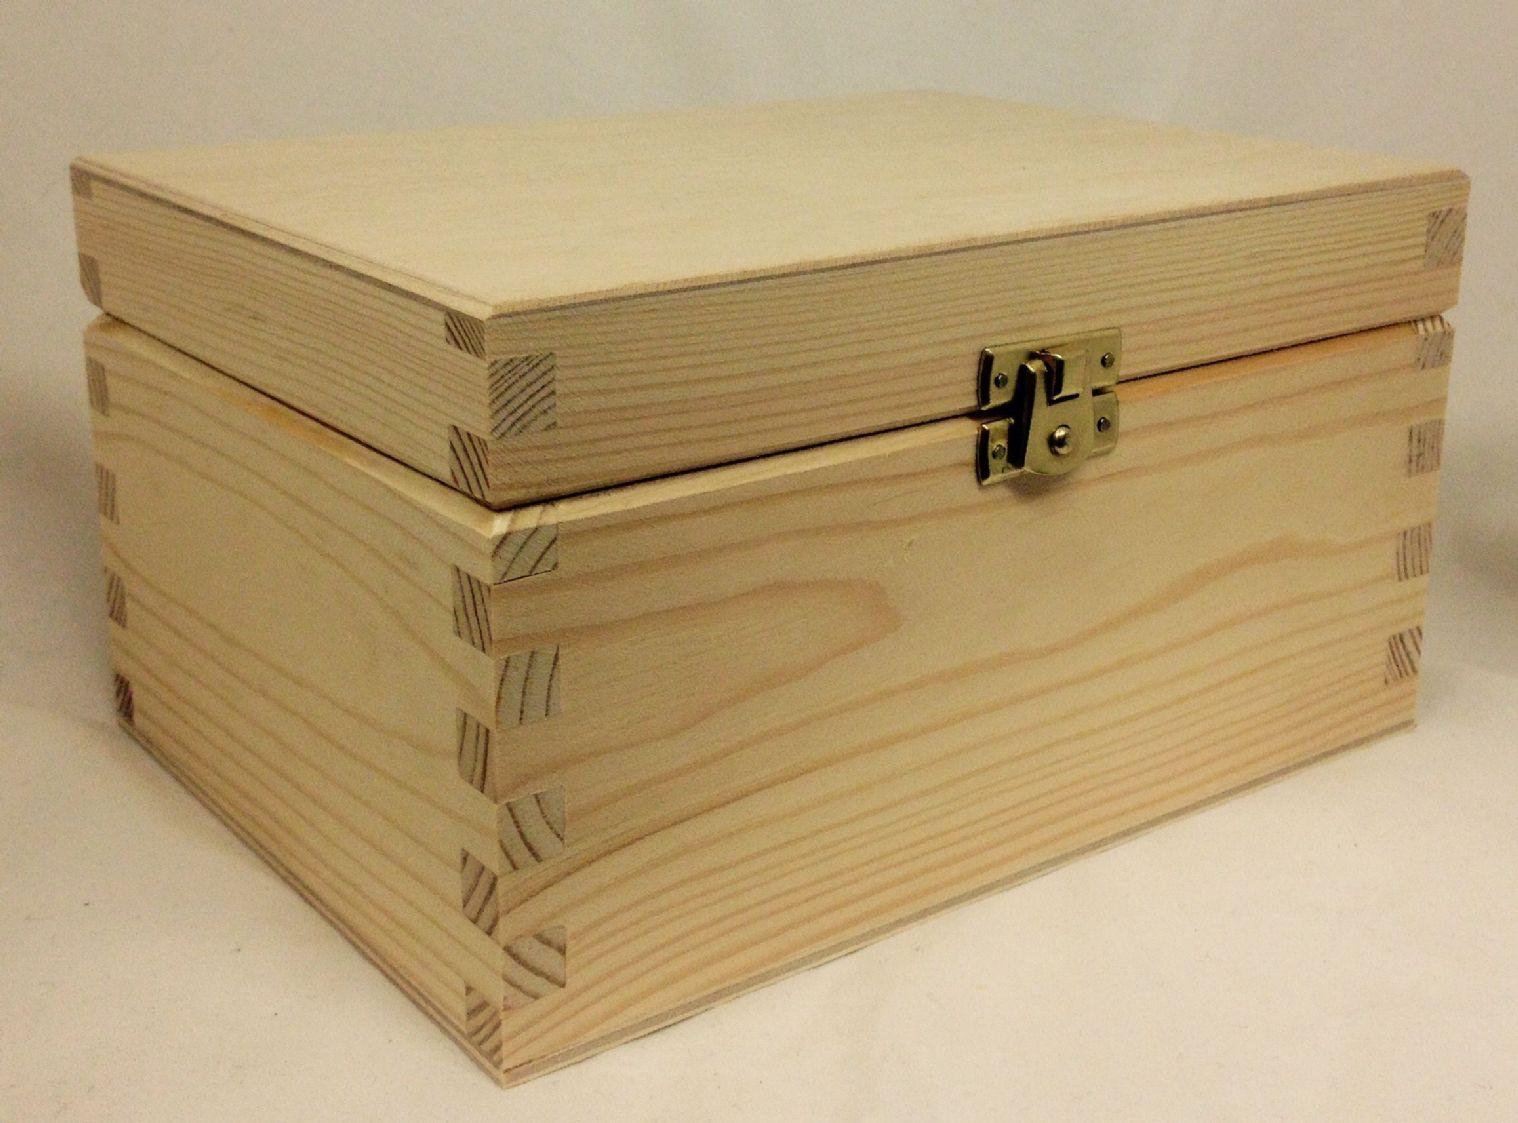 marvellous wooden storage boxes